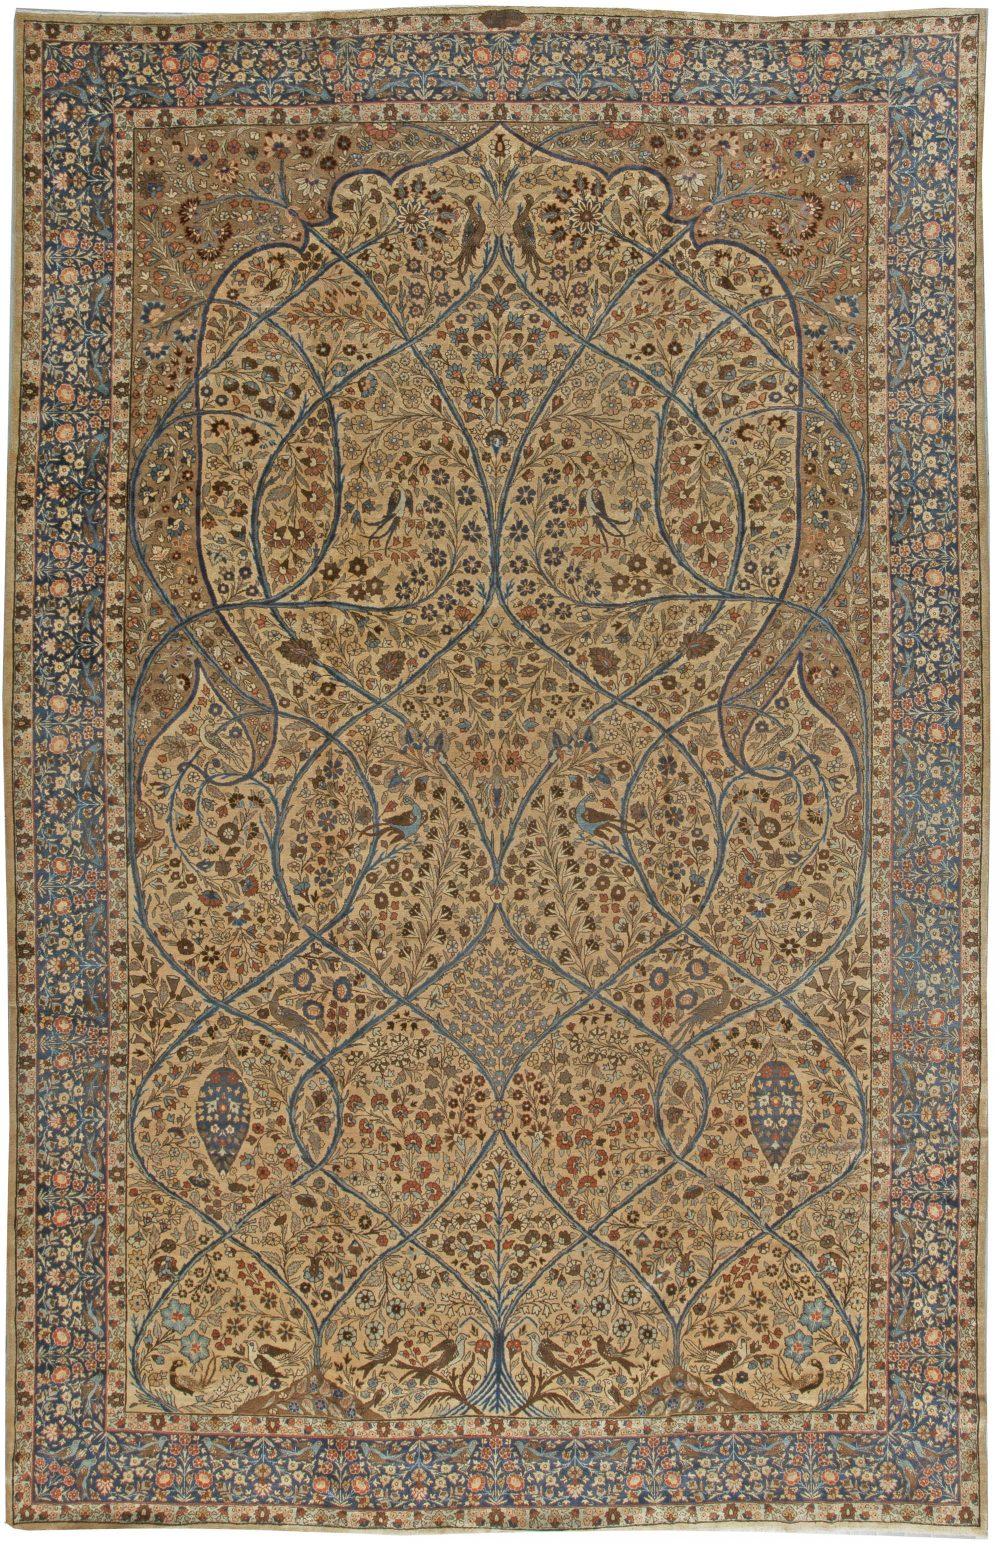 Antique Persian Tabriz Carpet BB5552